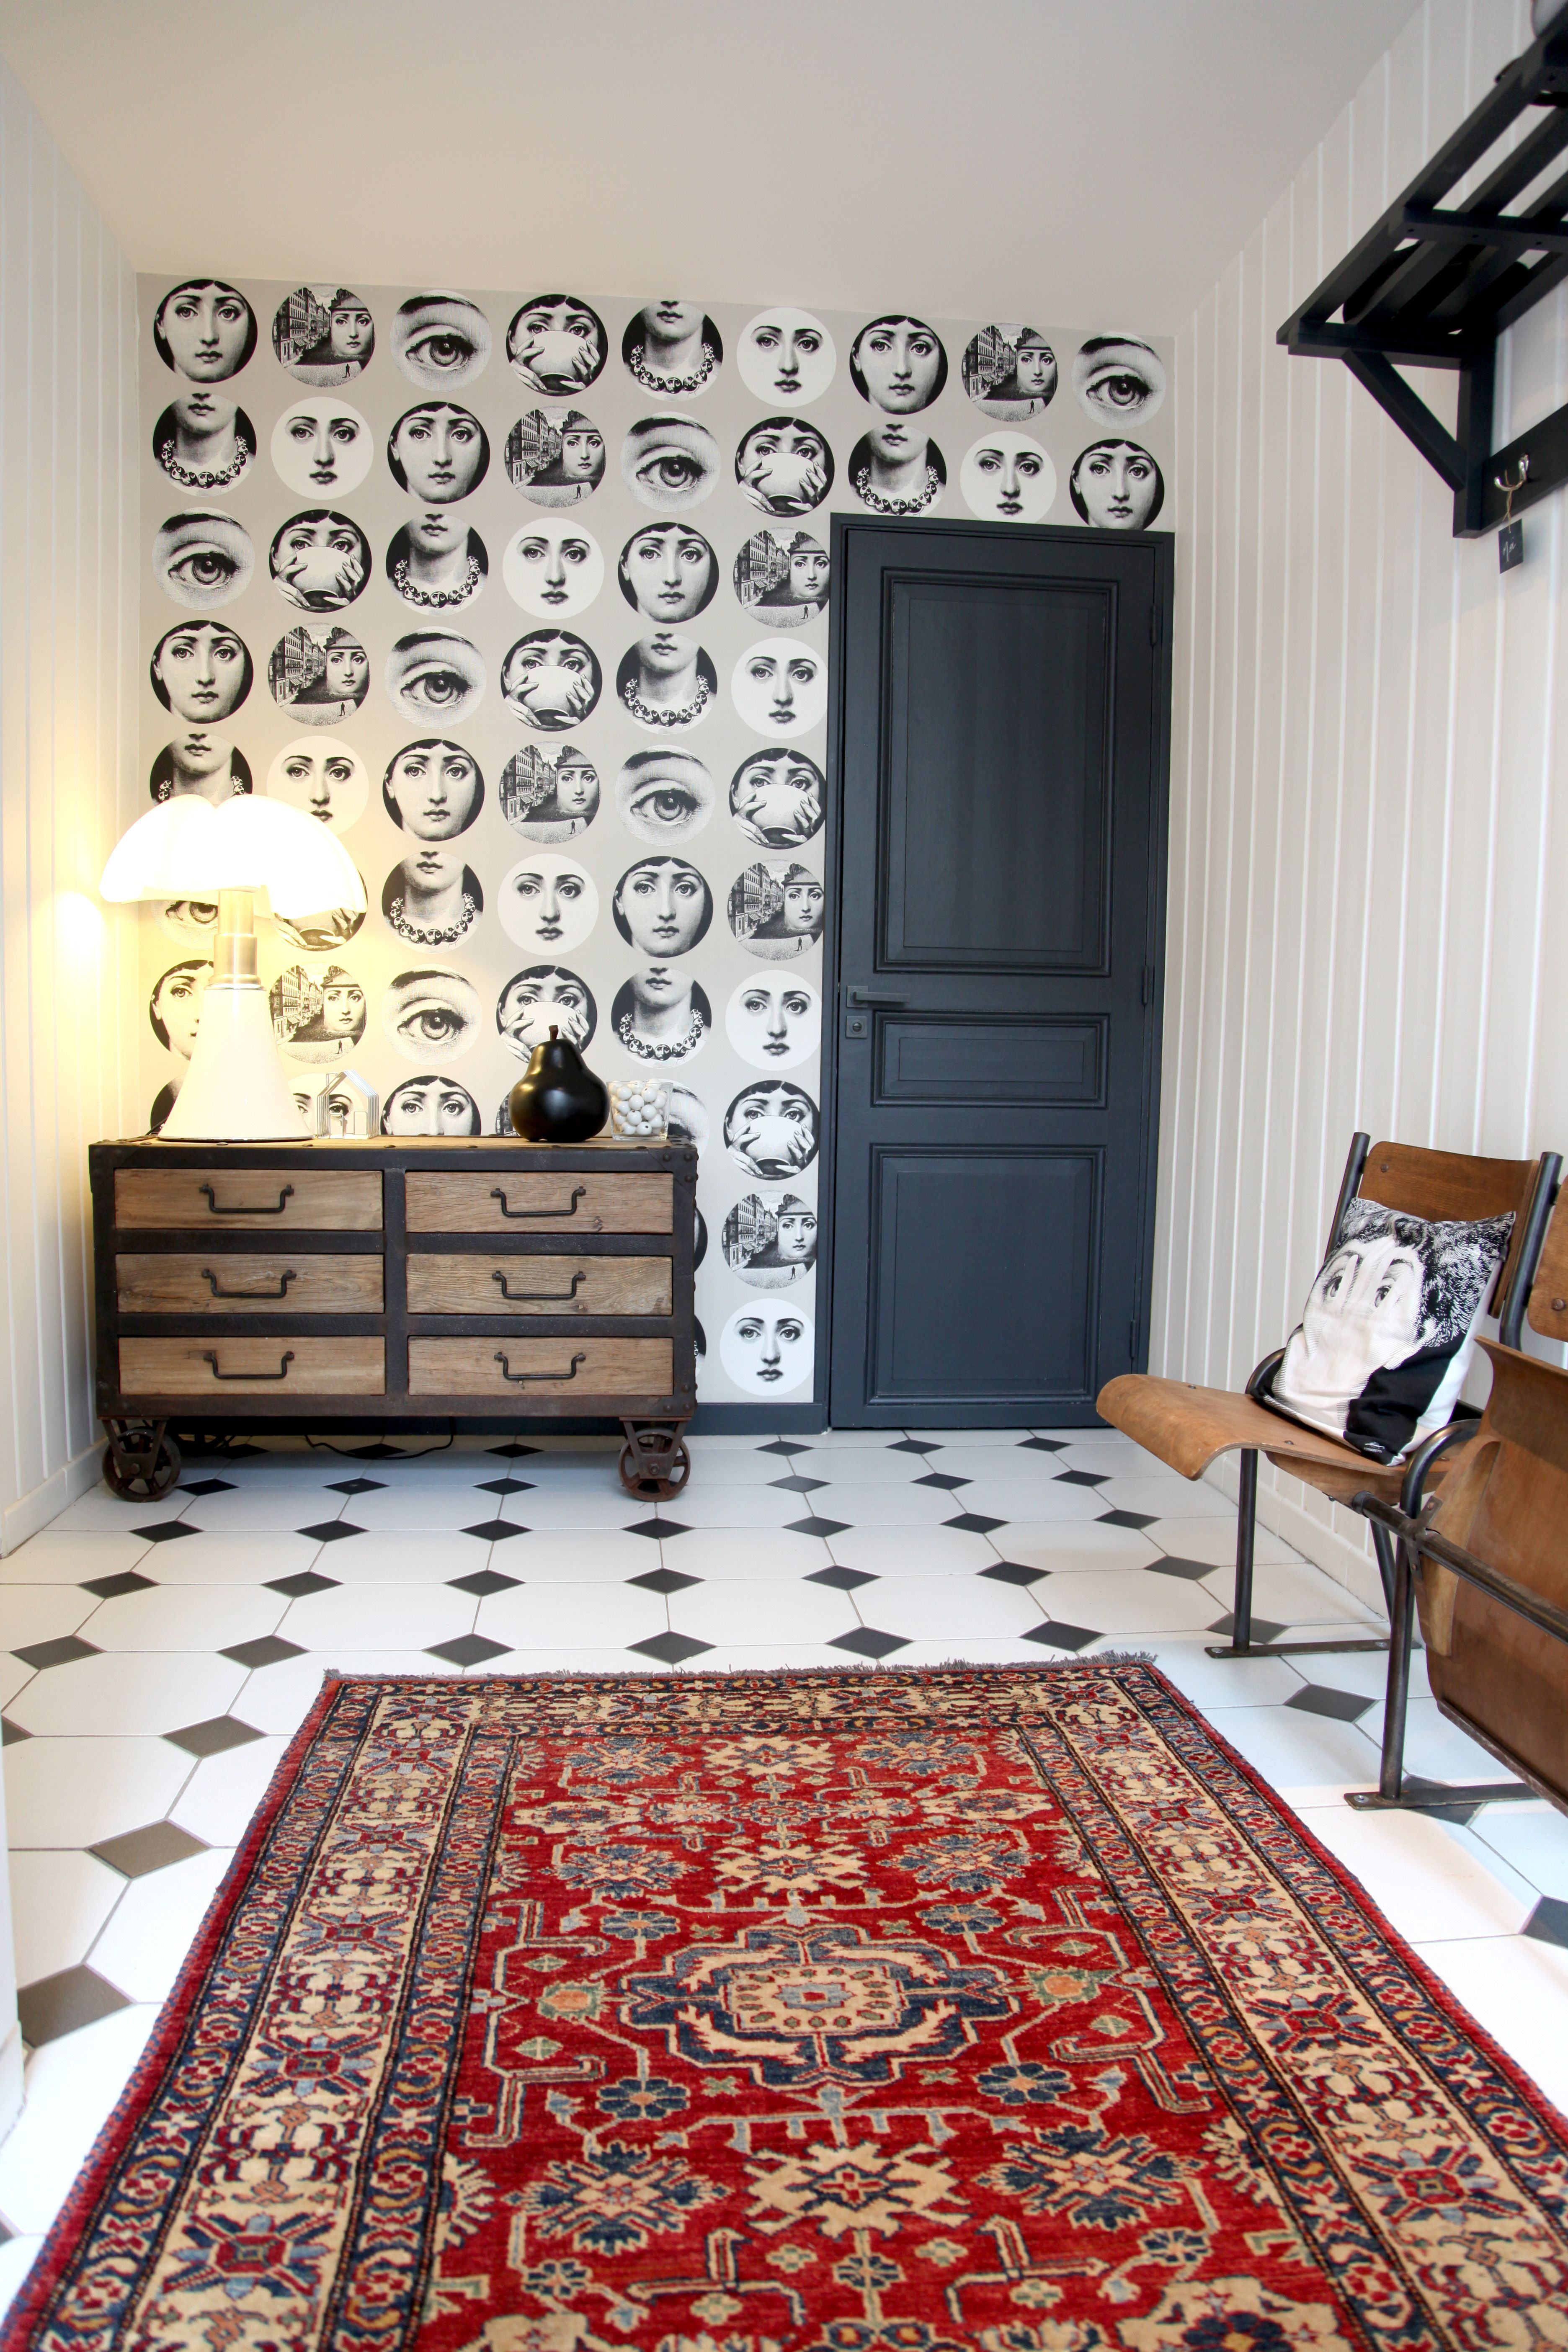 entr e de caract re avec papier peint fornasetti my. Black Bedroom Furniture Sets. Home Design Ideas